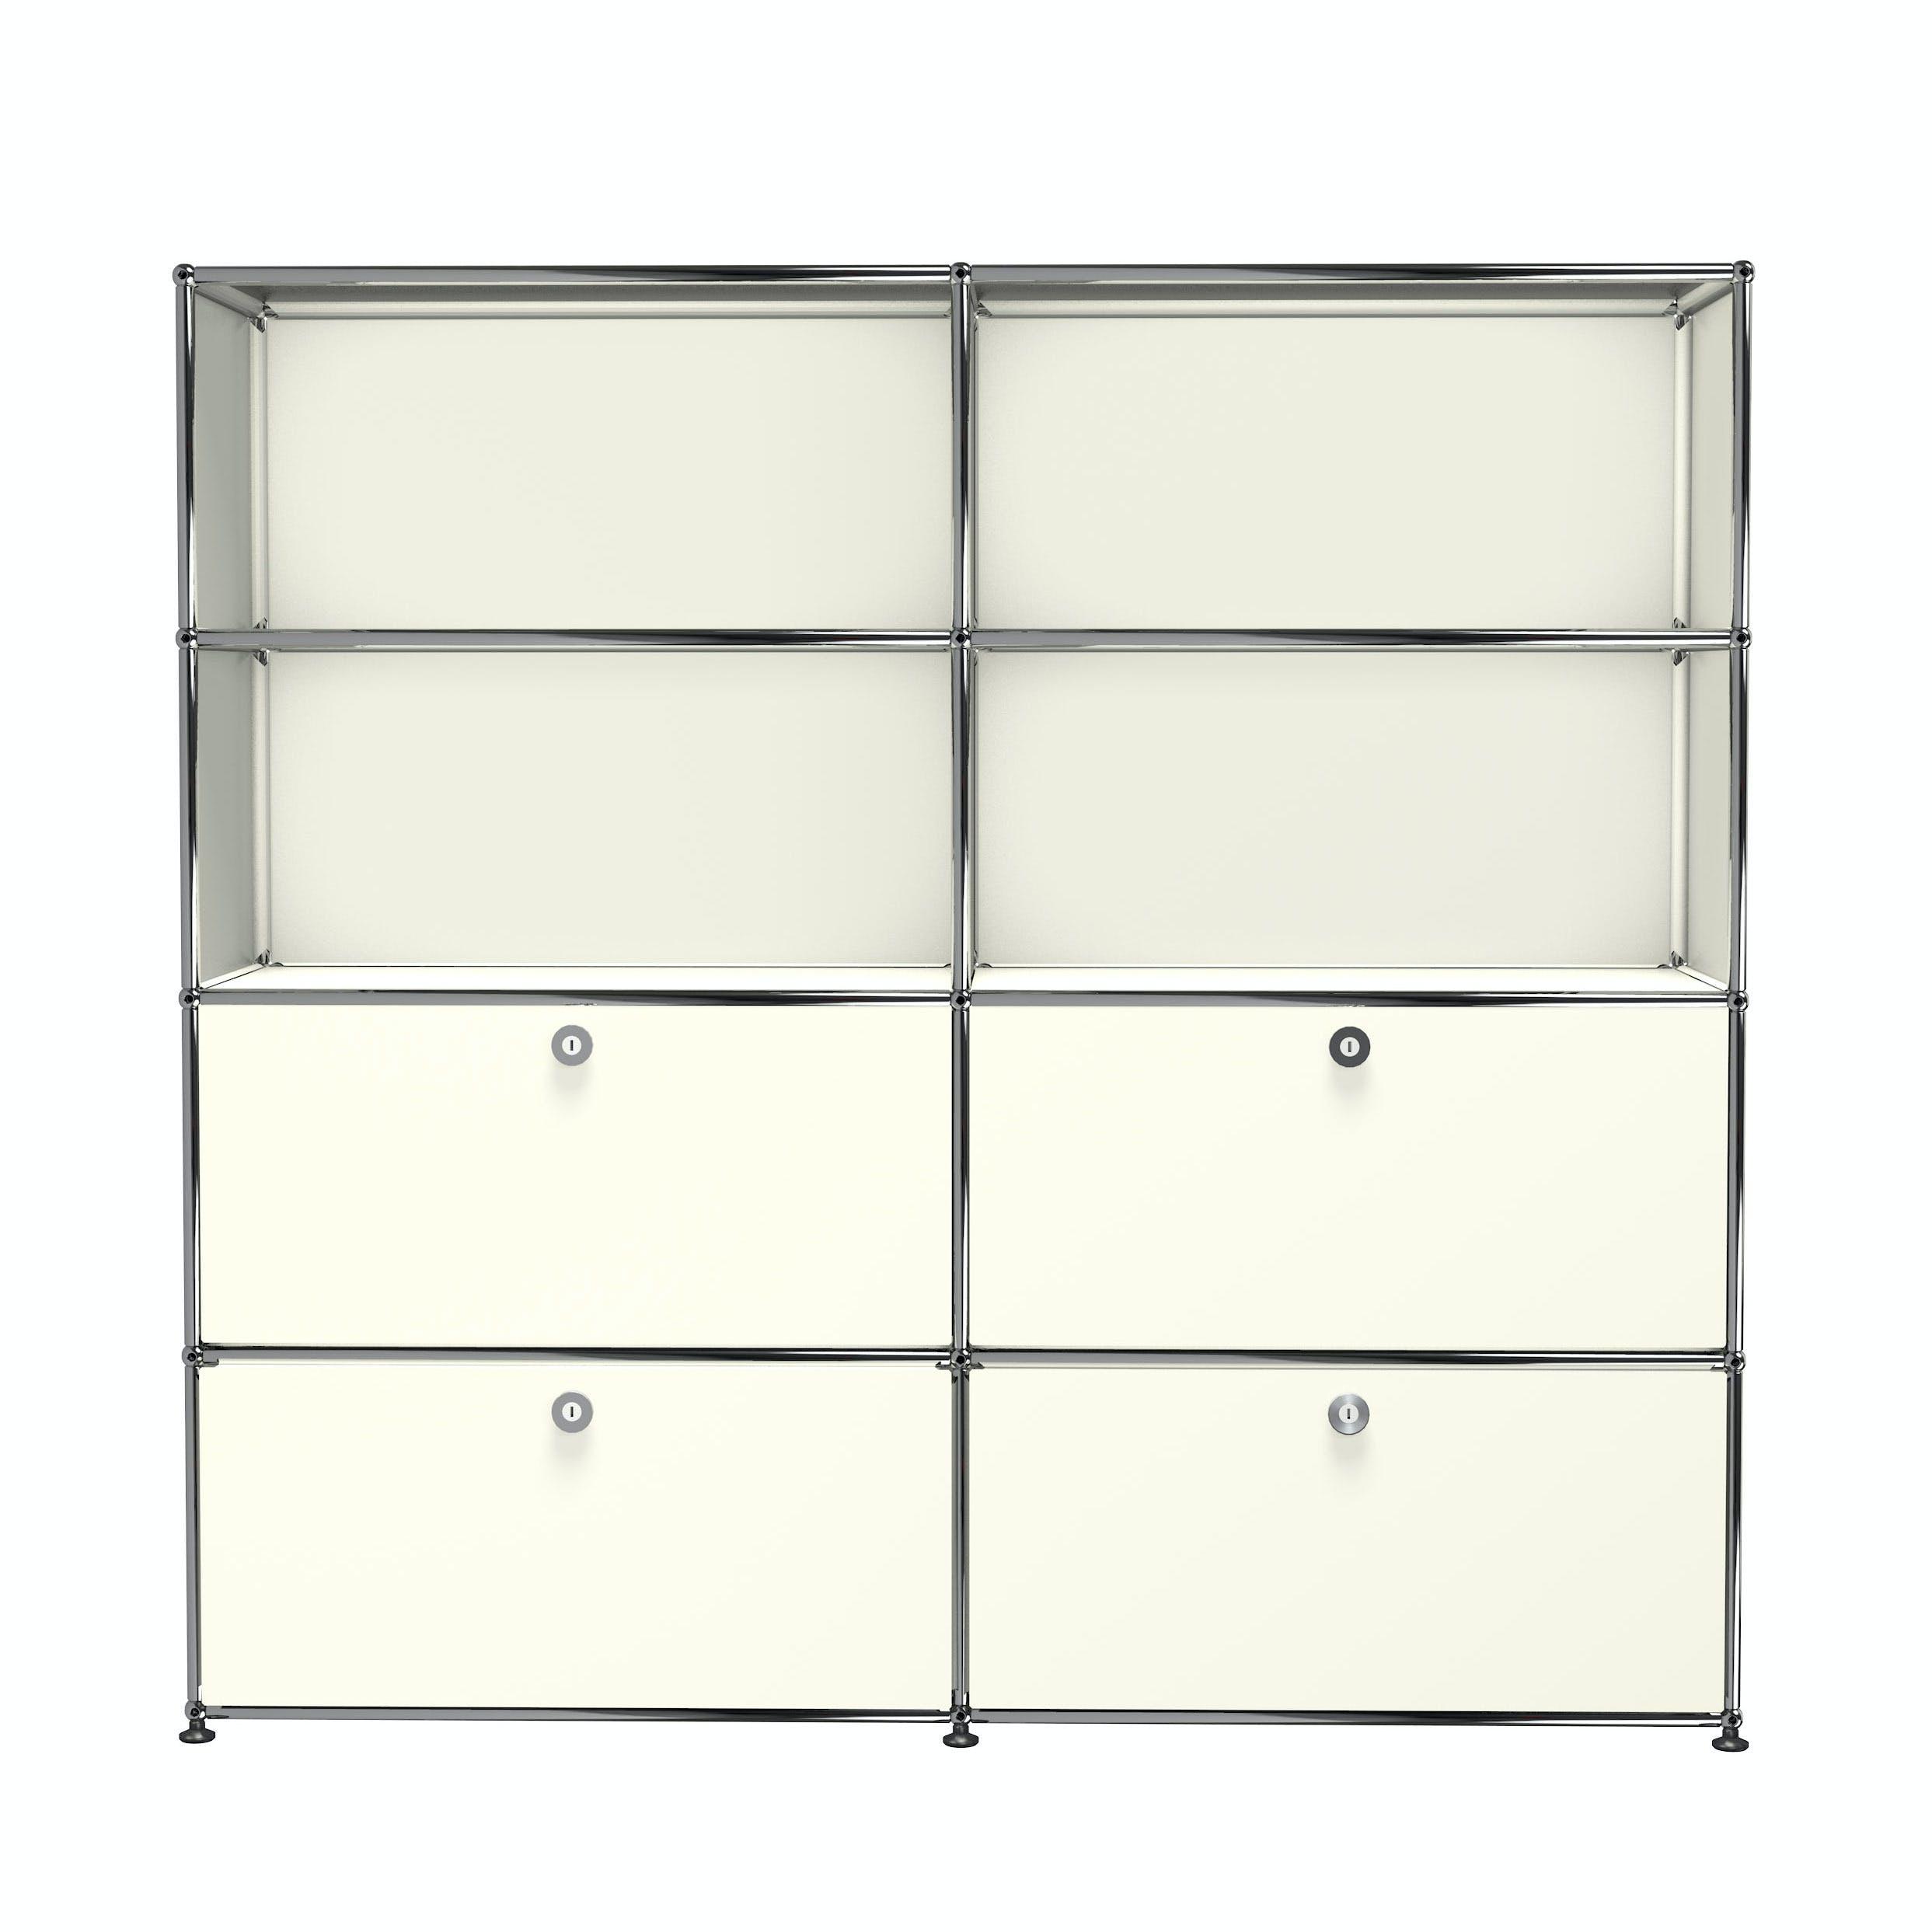 Usm-quick-ship-Haller-Storage-S2-white-haute-living